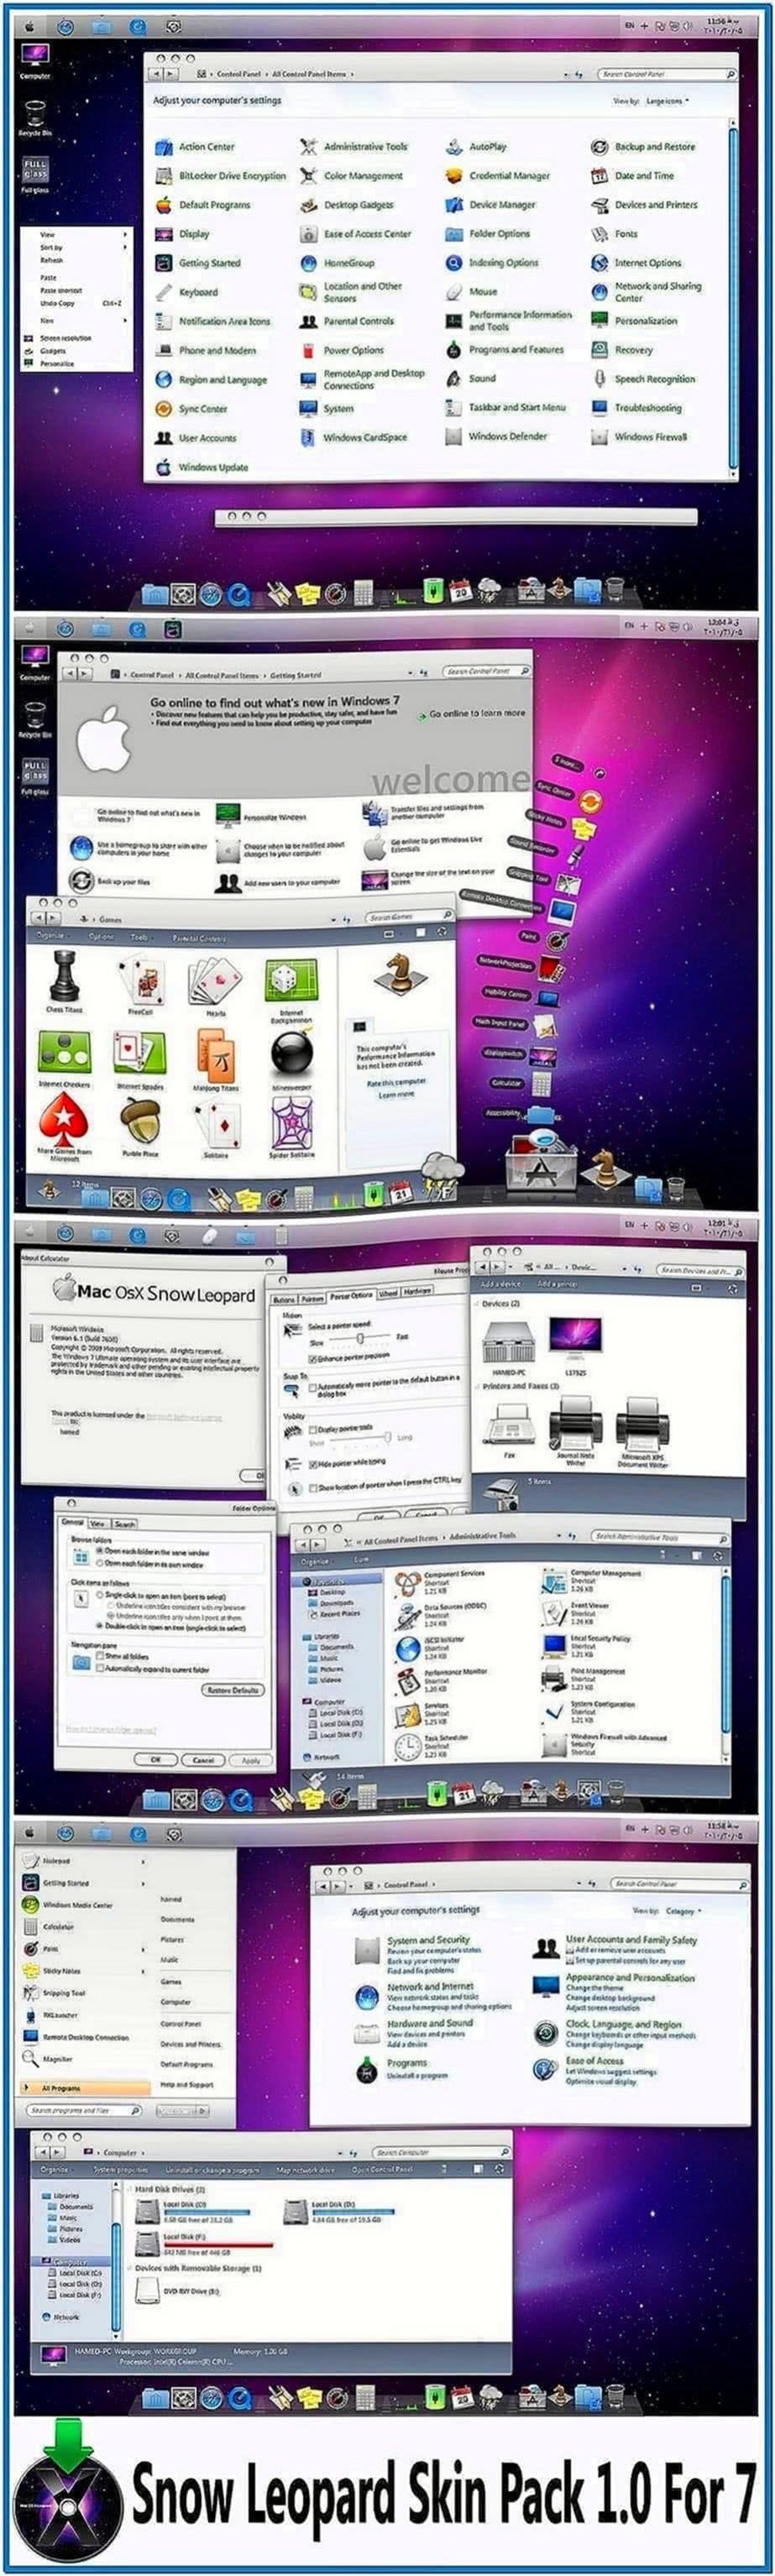 Screensavers pack x86 64bit